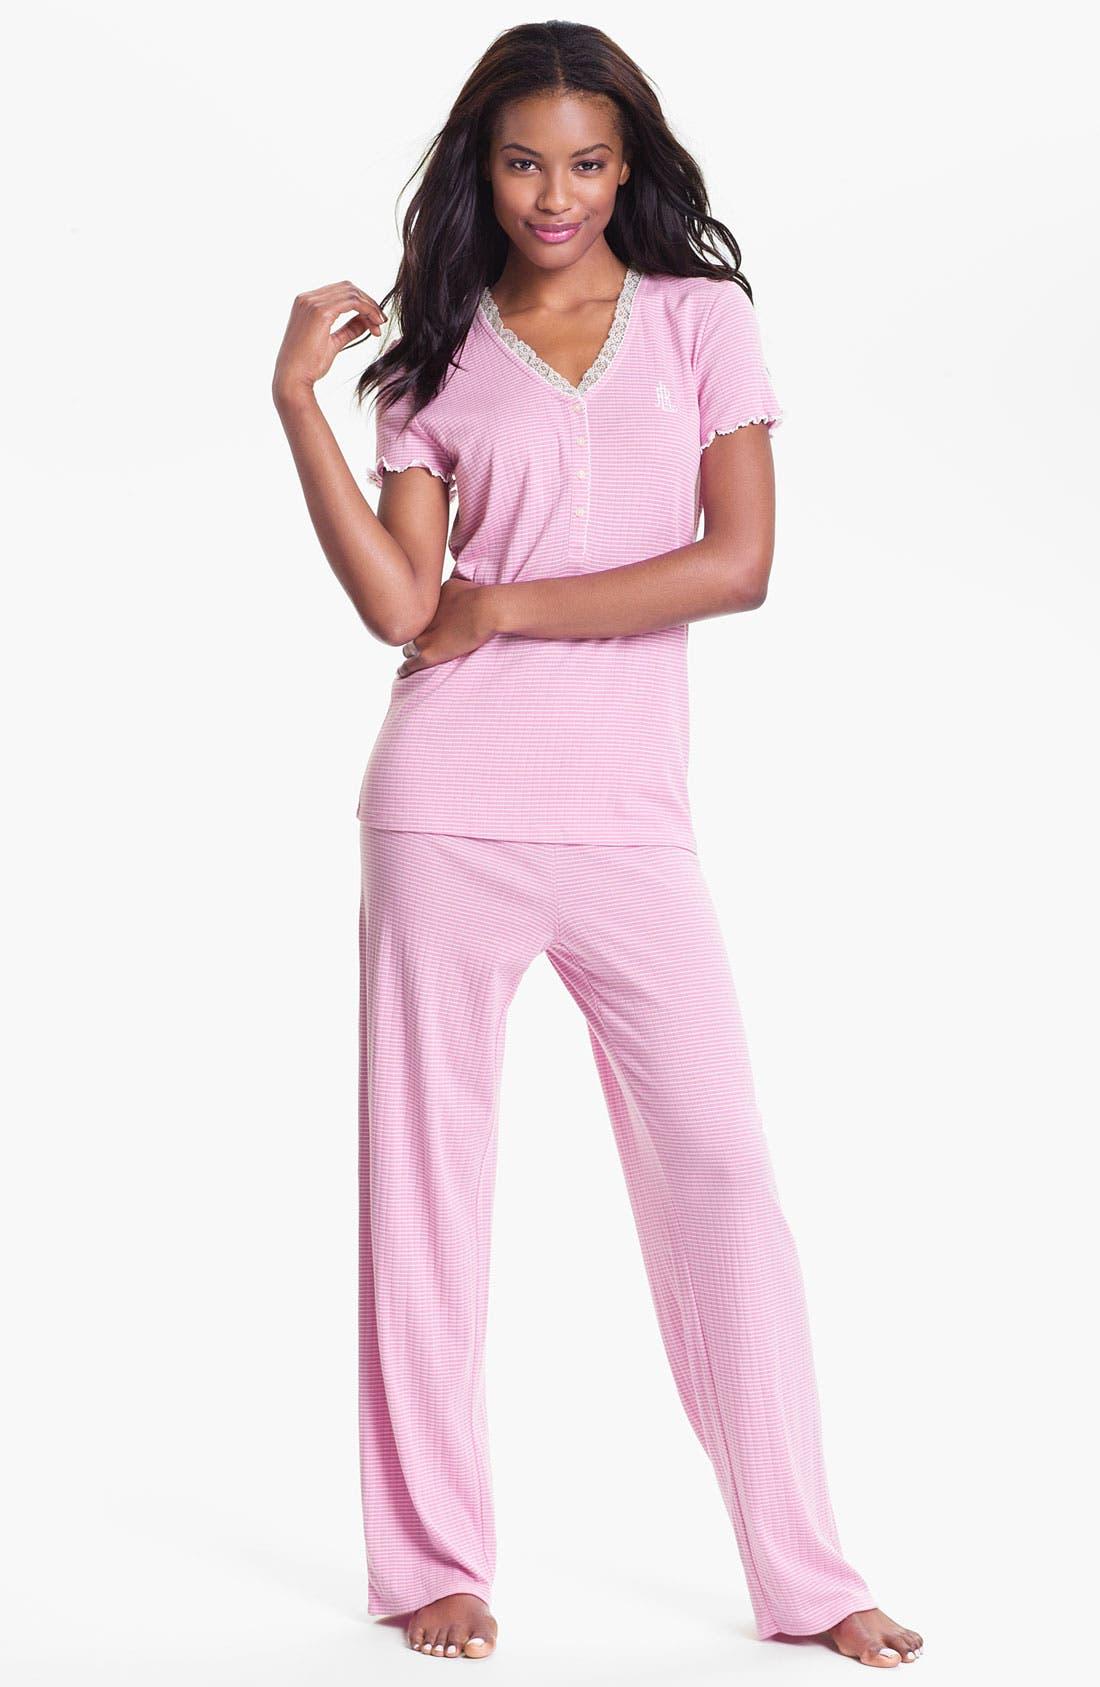 Main Image - Lauren Ralph Lauren Lace Trim Ribbed Knit Pajamas